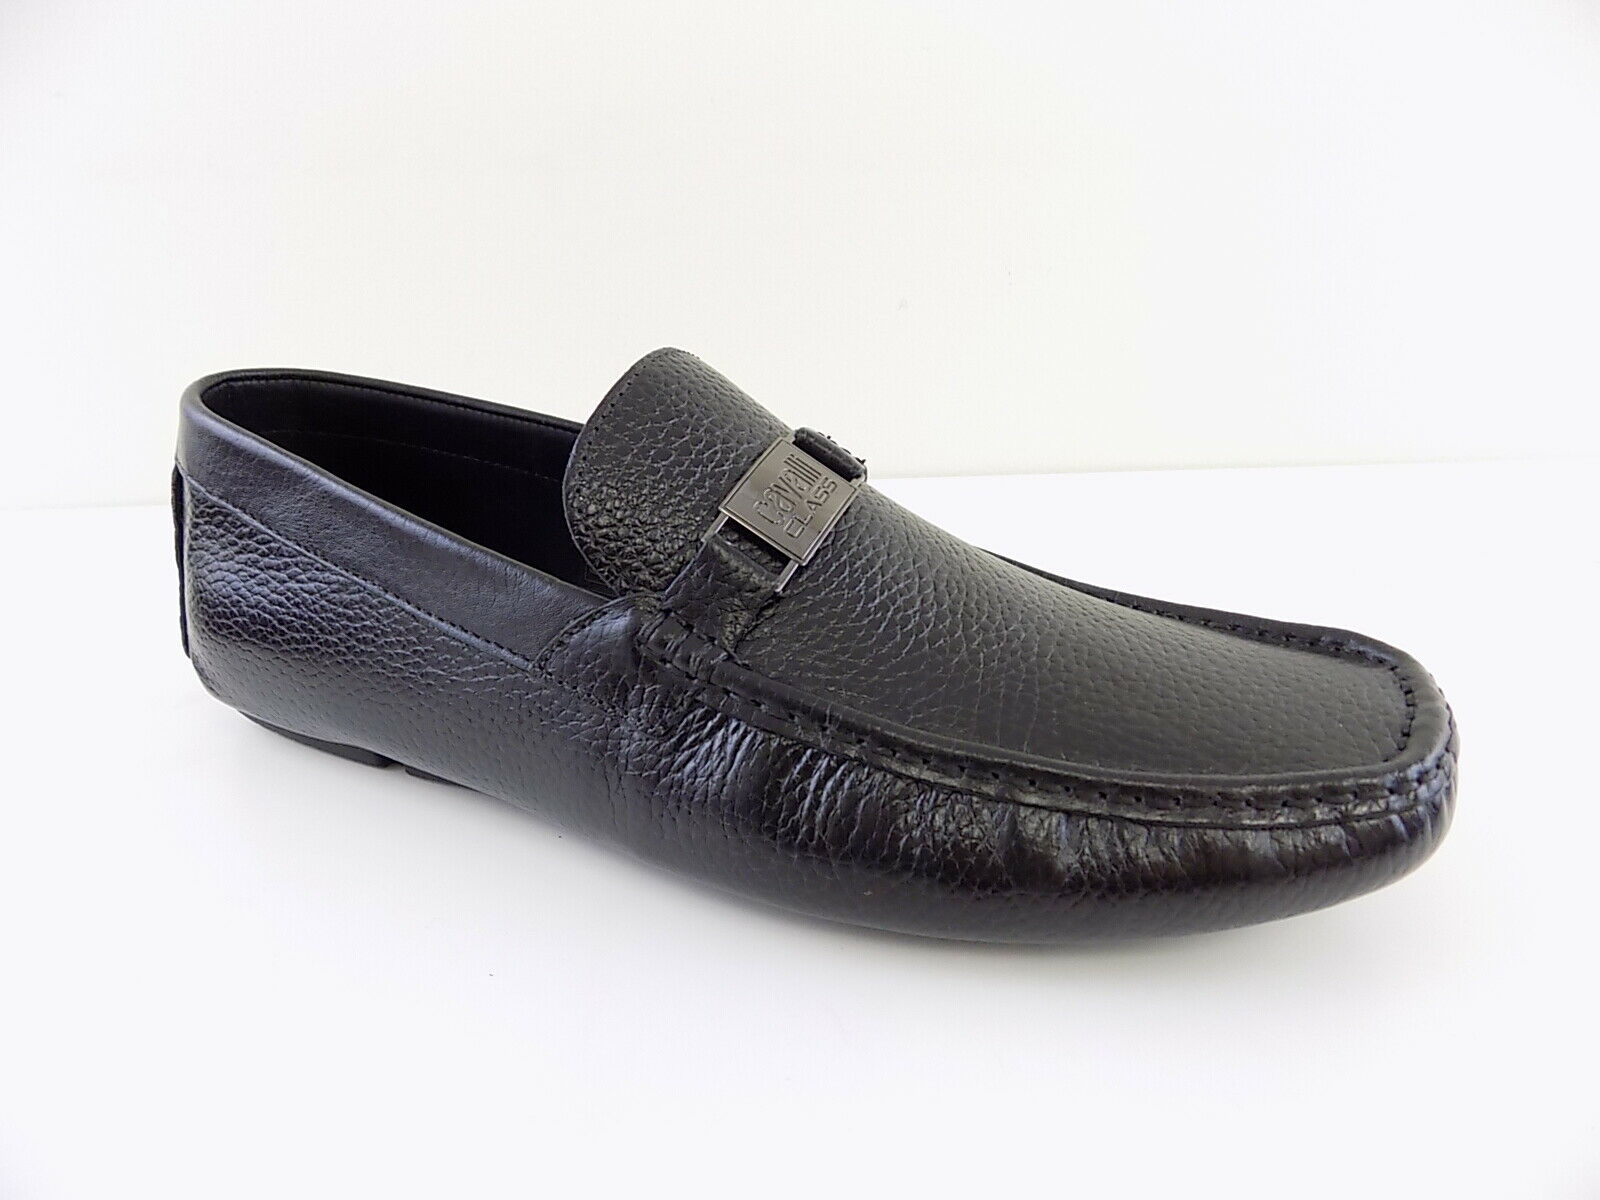 ROBERTO CAVALLI  430  Black MEN SZ 12(45)M Loafers & Slip Ons PEBBLED shoes D16